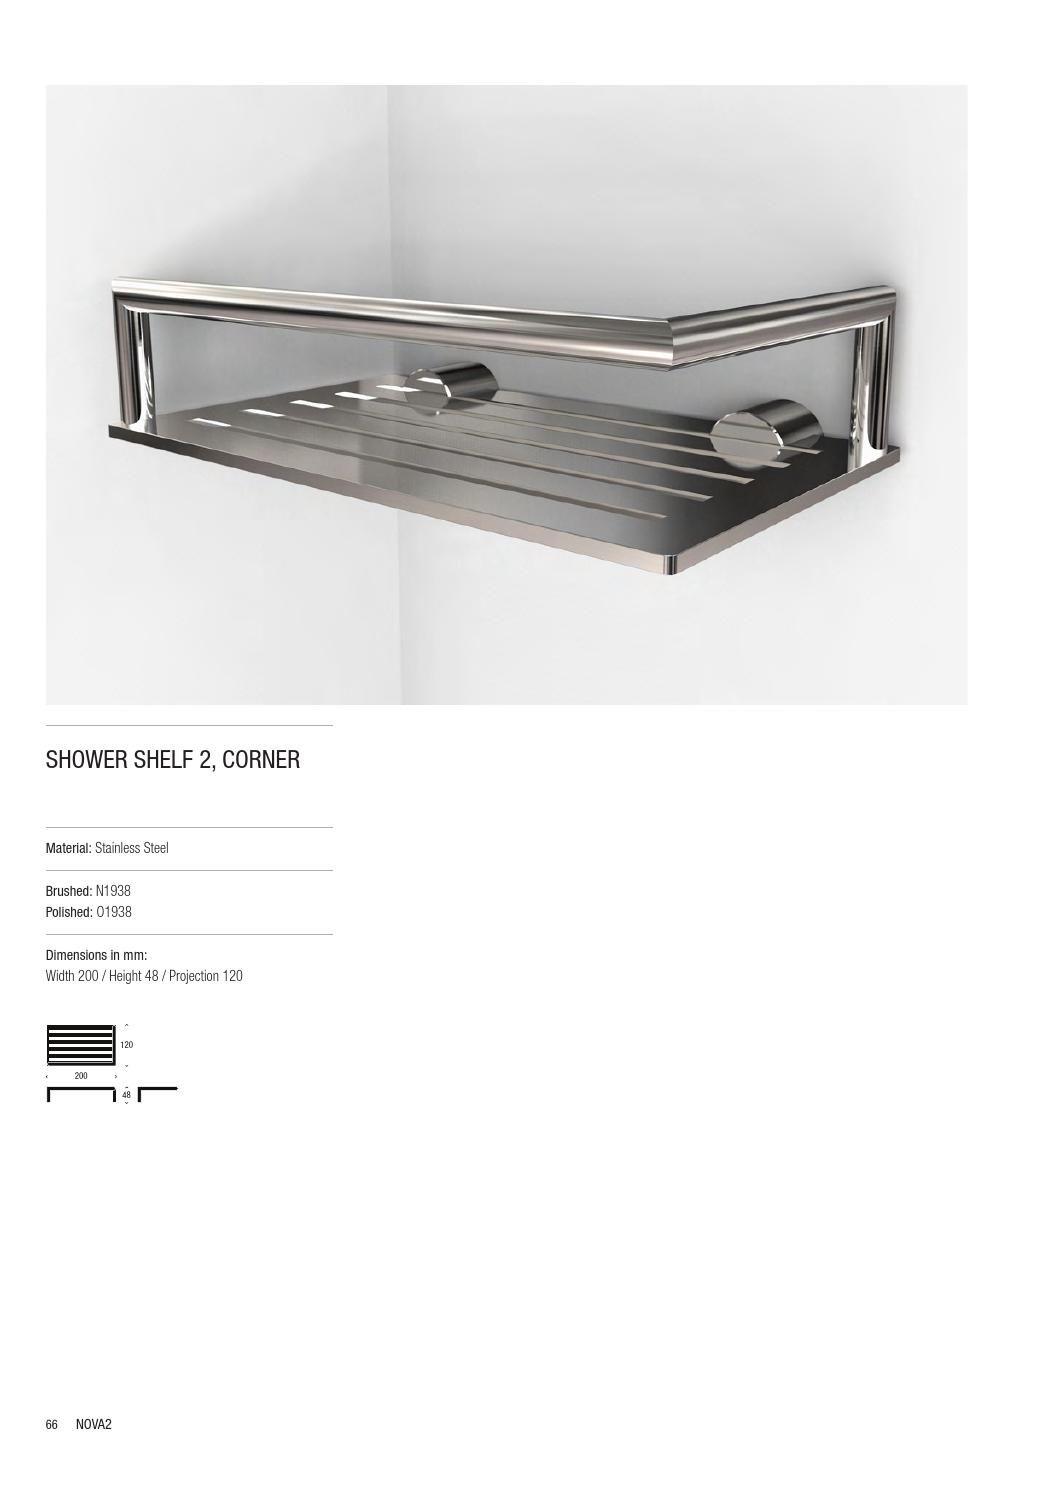 Frost nova2 #bathroom #accessories | FROST NOVA2 Collection ...